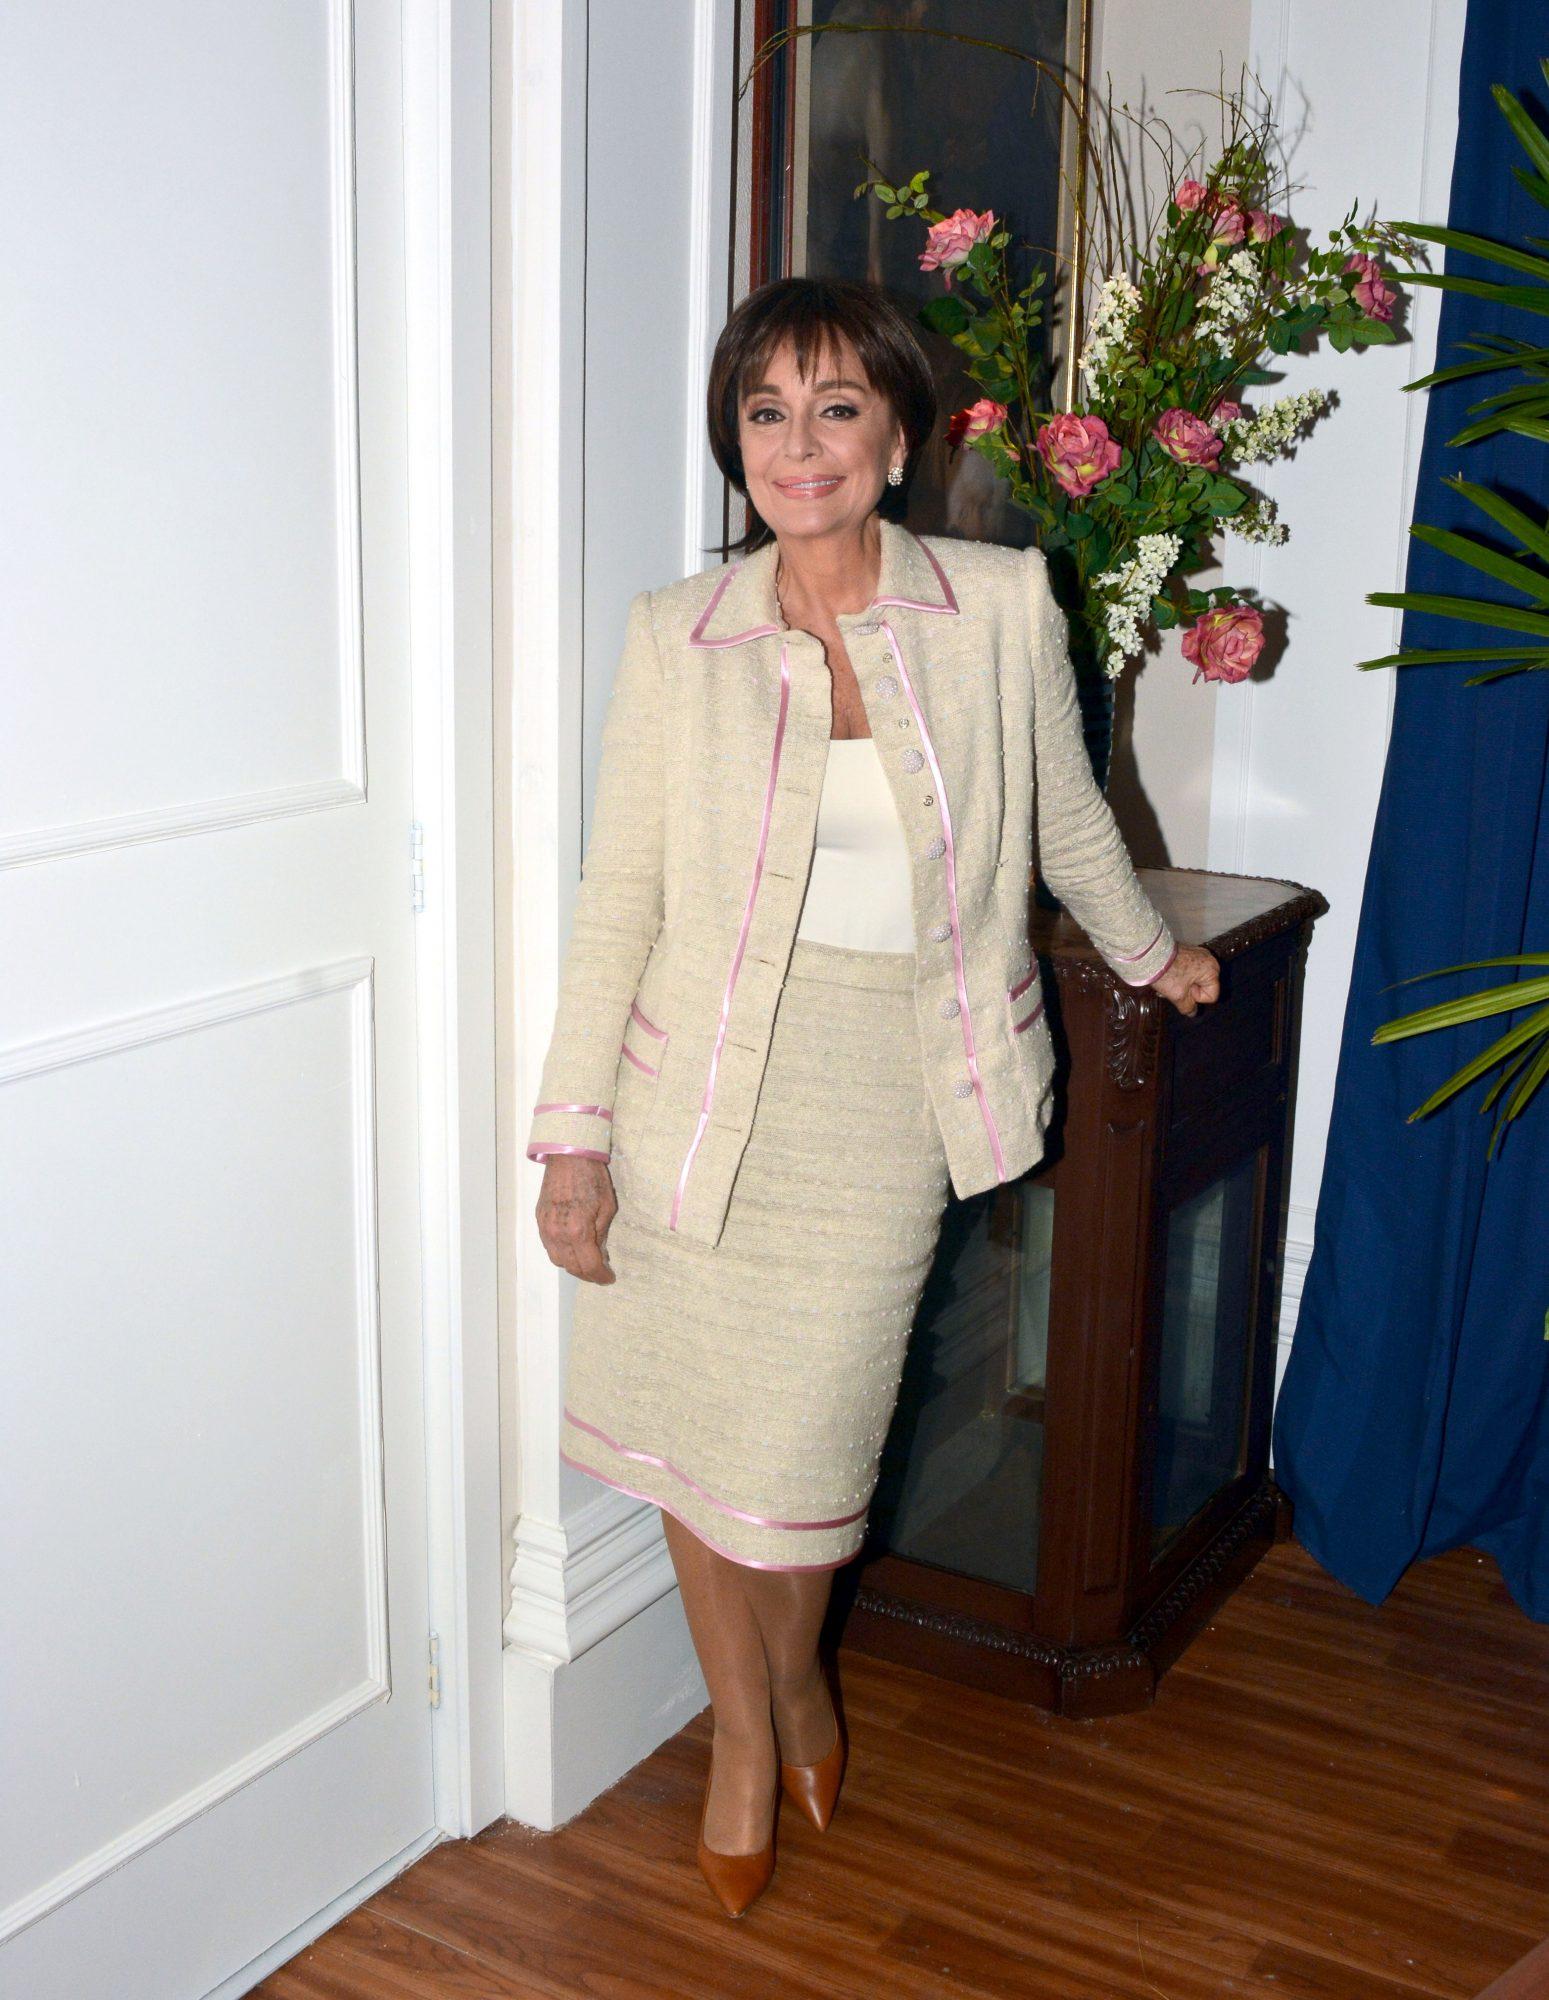 Mónica Sánchez Navarro